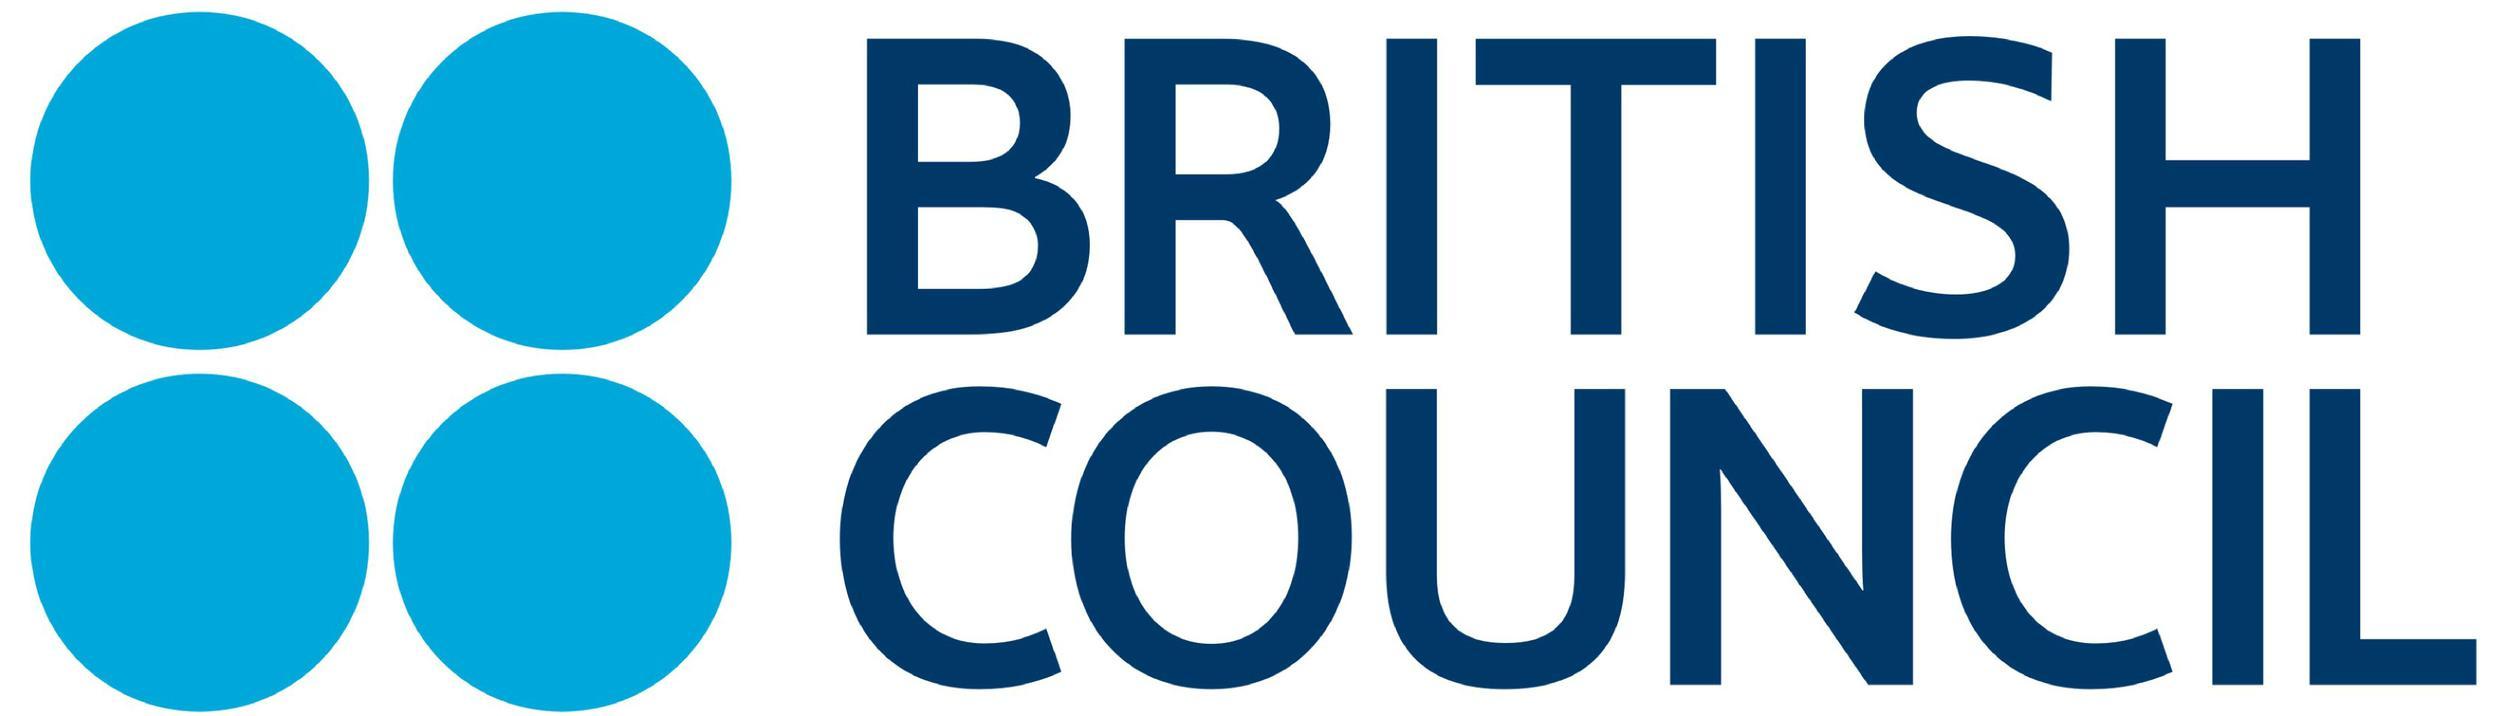 British Council Webpage